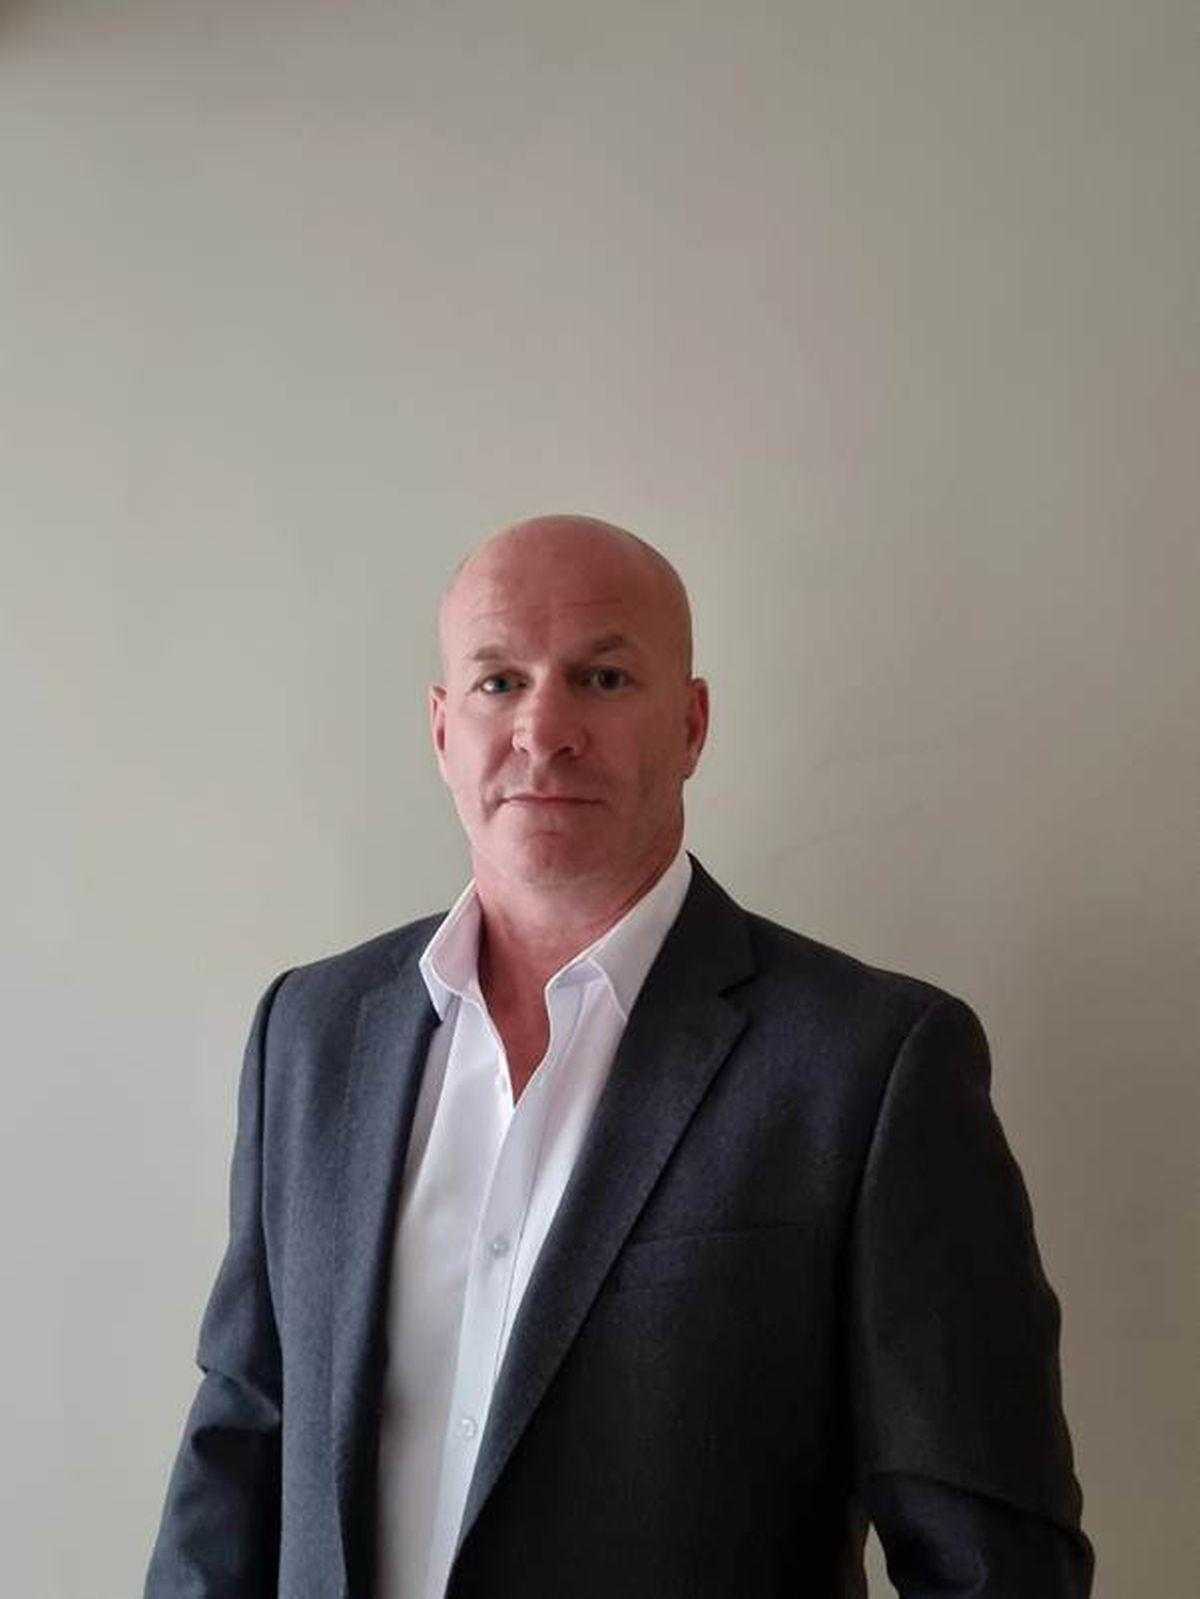 Martin Brown, chief executive, Barhale